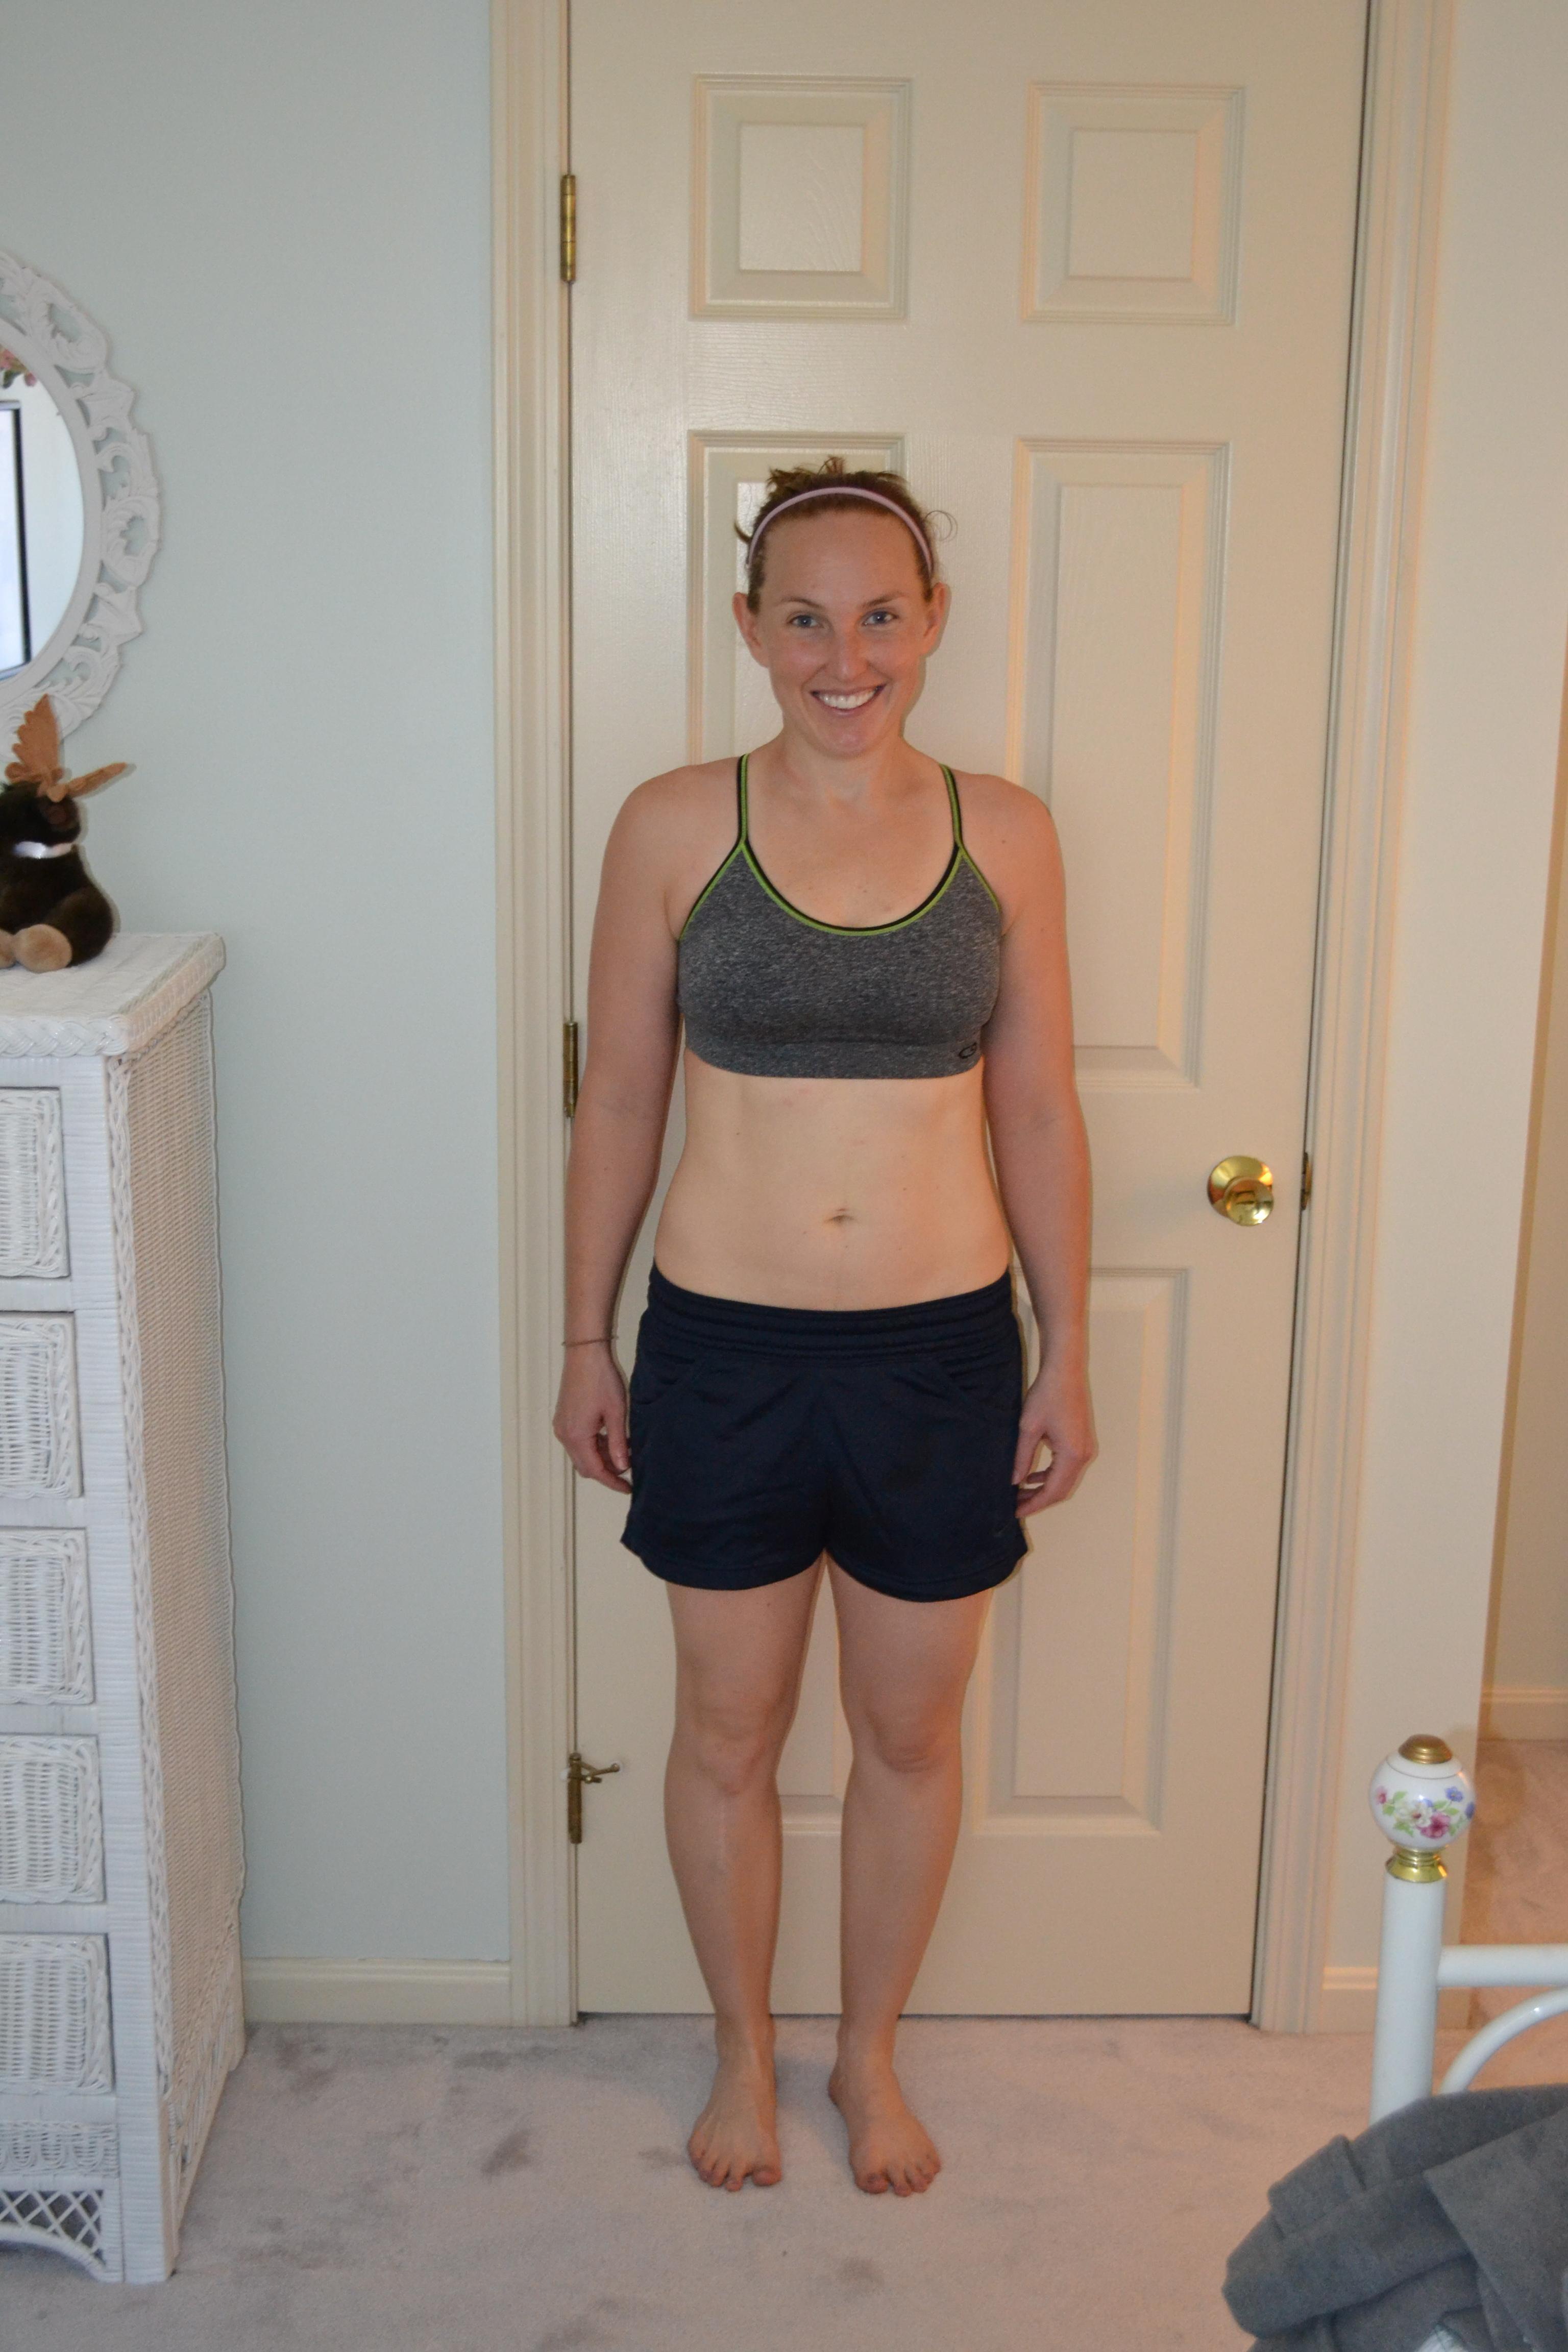 Losing Baby Weight: 5 Month Progress Update